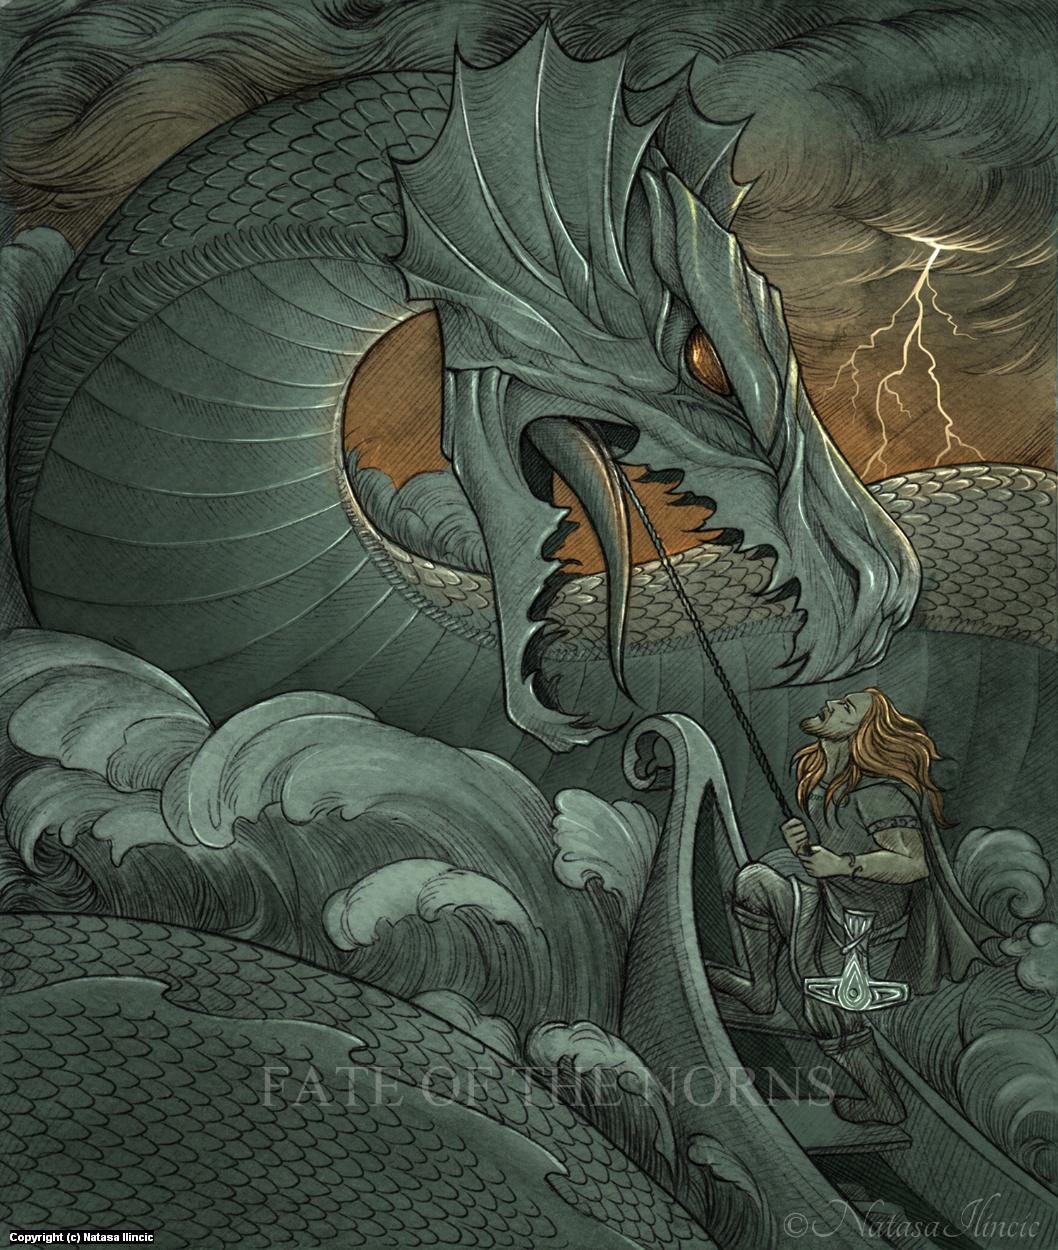 Thor against Jormungandr Artwork by Natasa Ilincic